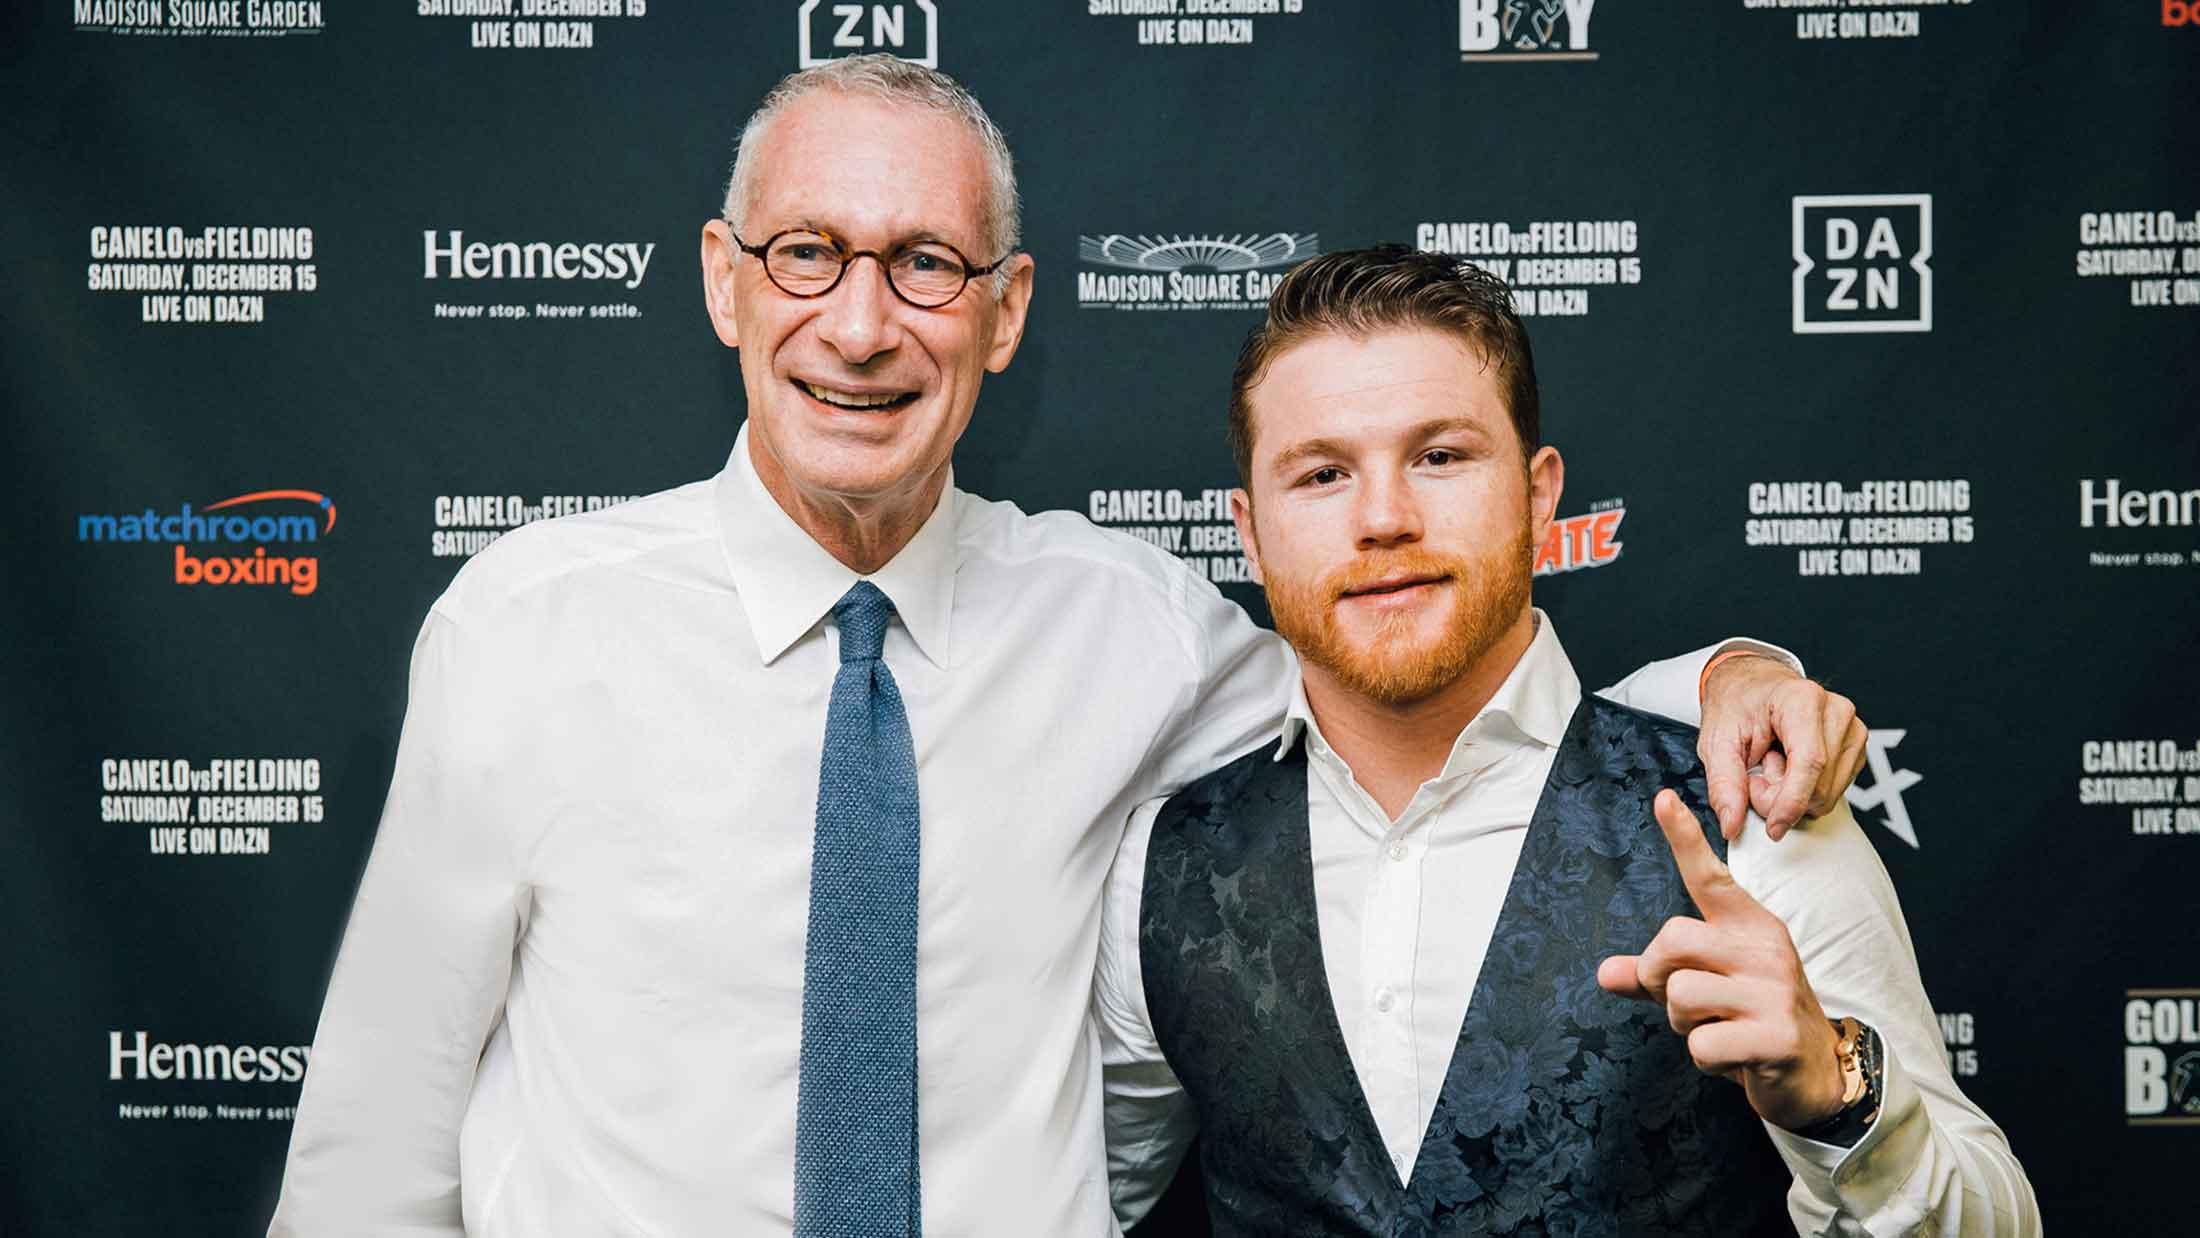 John Skipper with Mexican boxer Canelo Alvarez, who has signed an 11-fight, $365 million contract with DAZN / Photo: Amanda Westcott/DAZN.